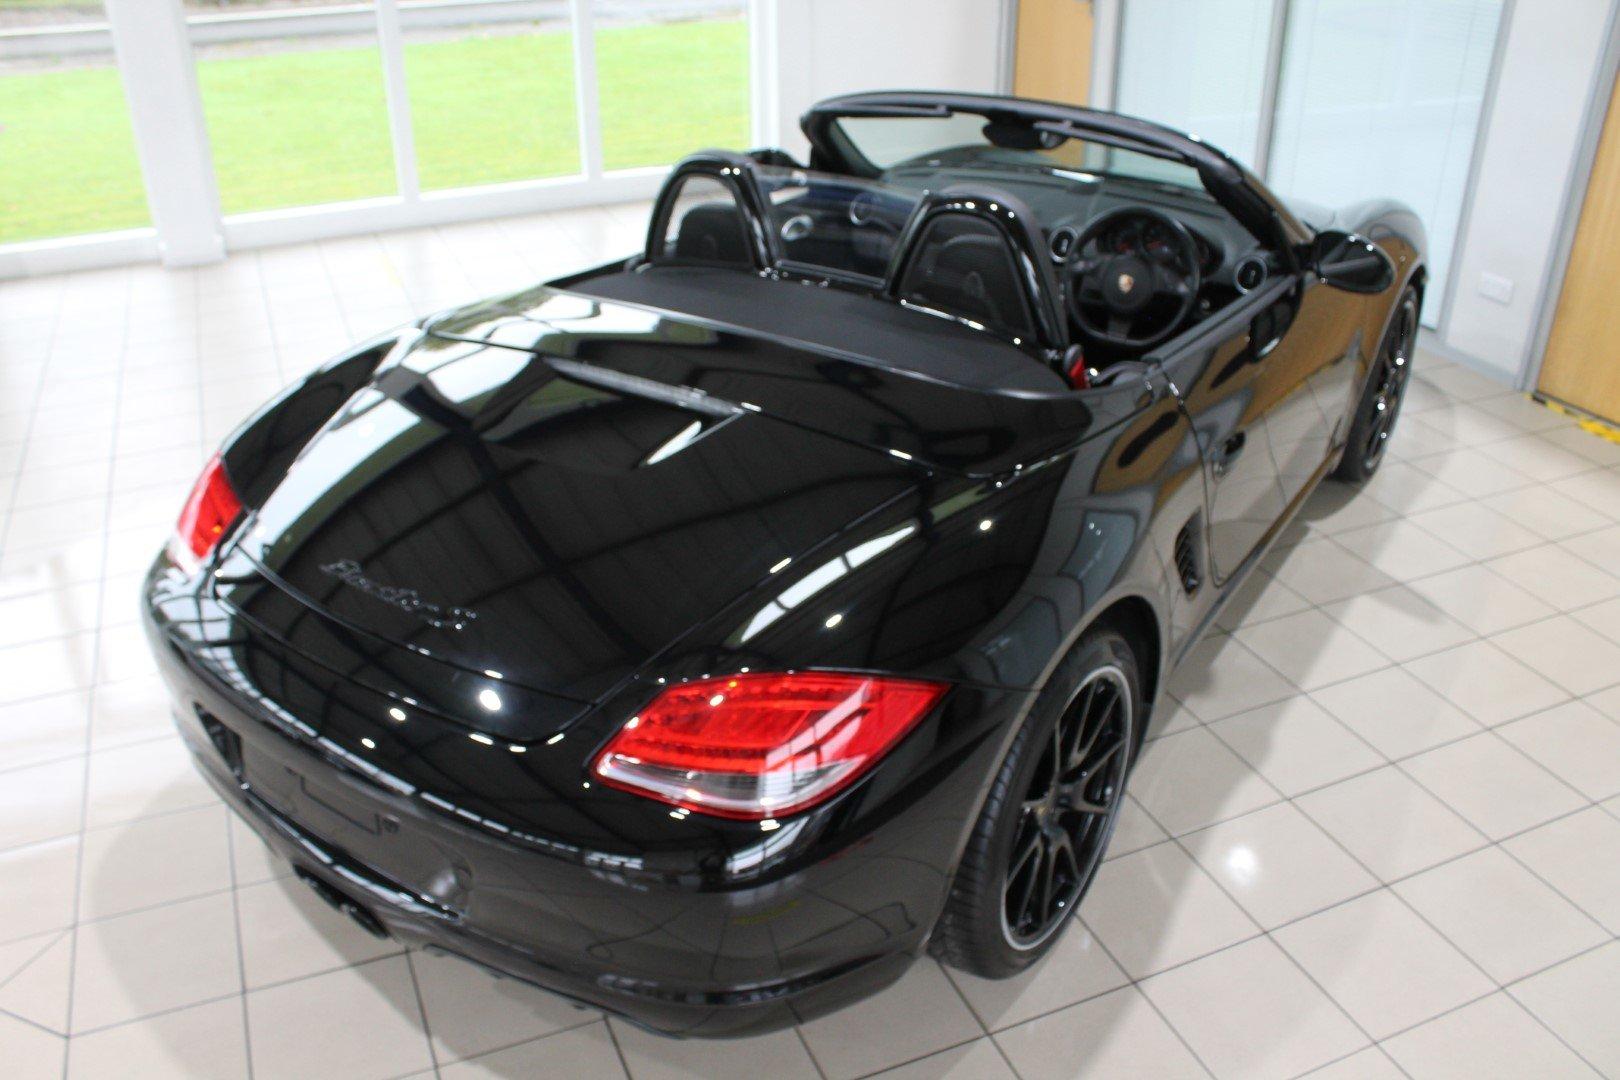 2011 Porsche Boxster (987) 3.4 S Black Edition Manual For Sale (picture 9 of 12)